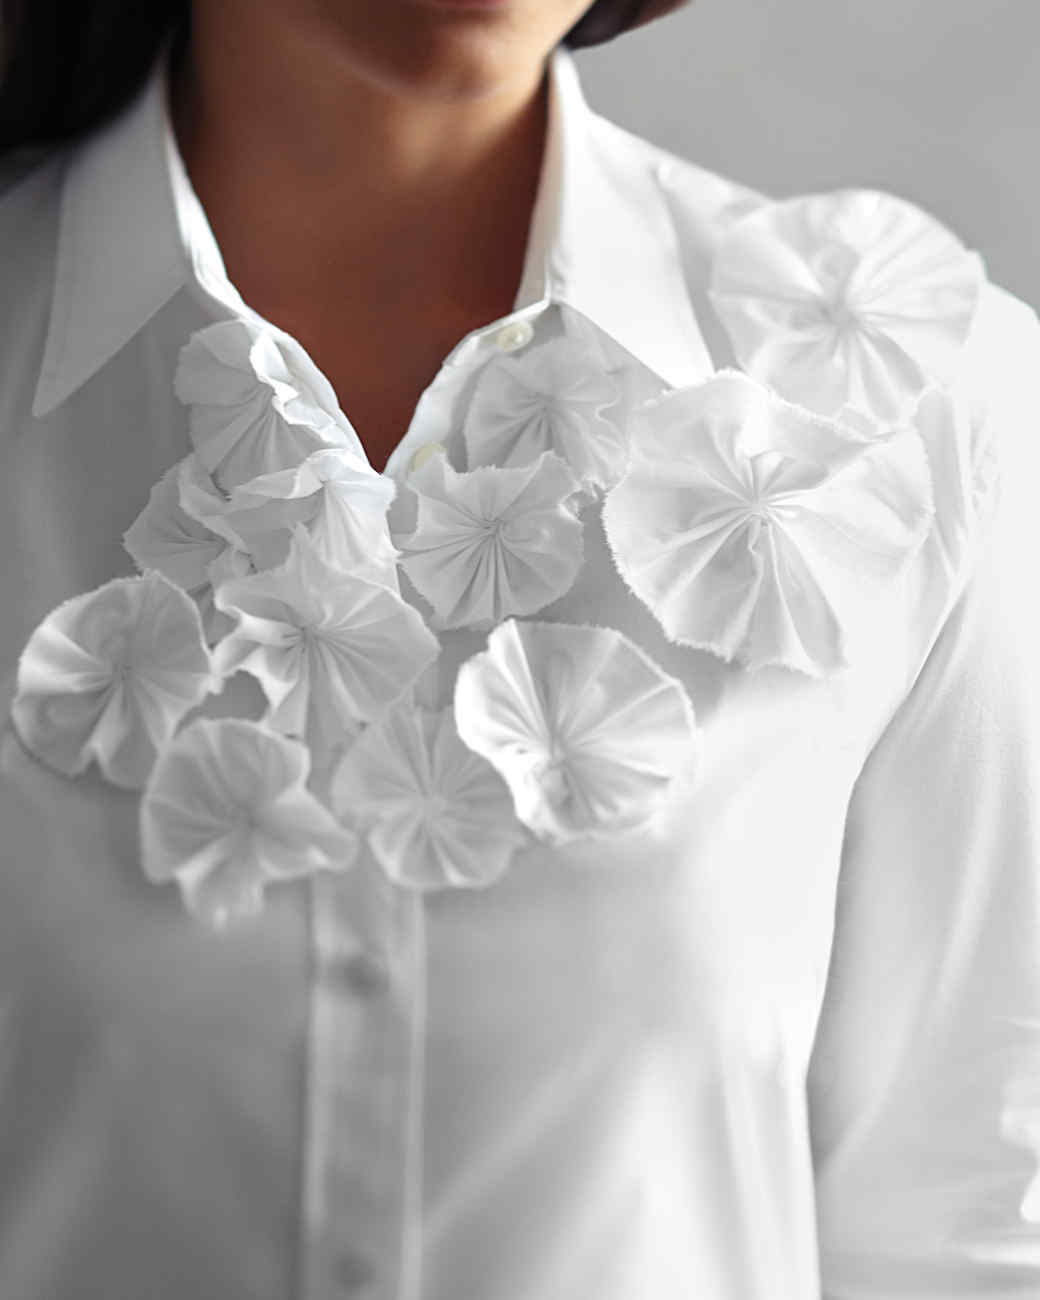 flower-shirt-208r-mld109400.jpg